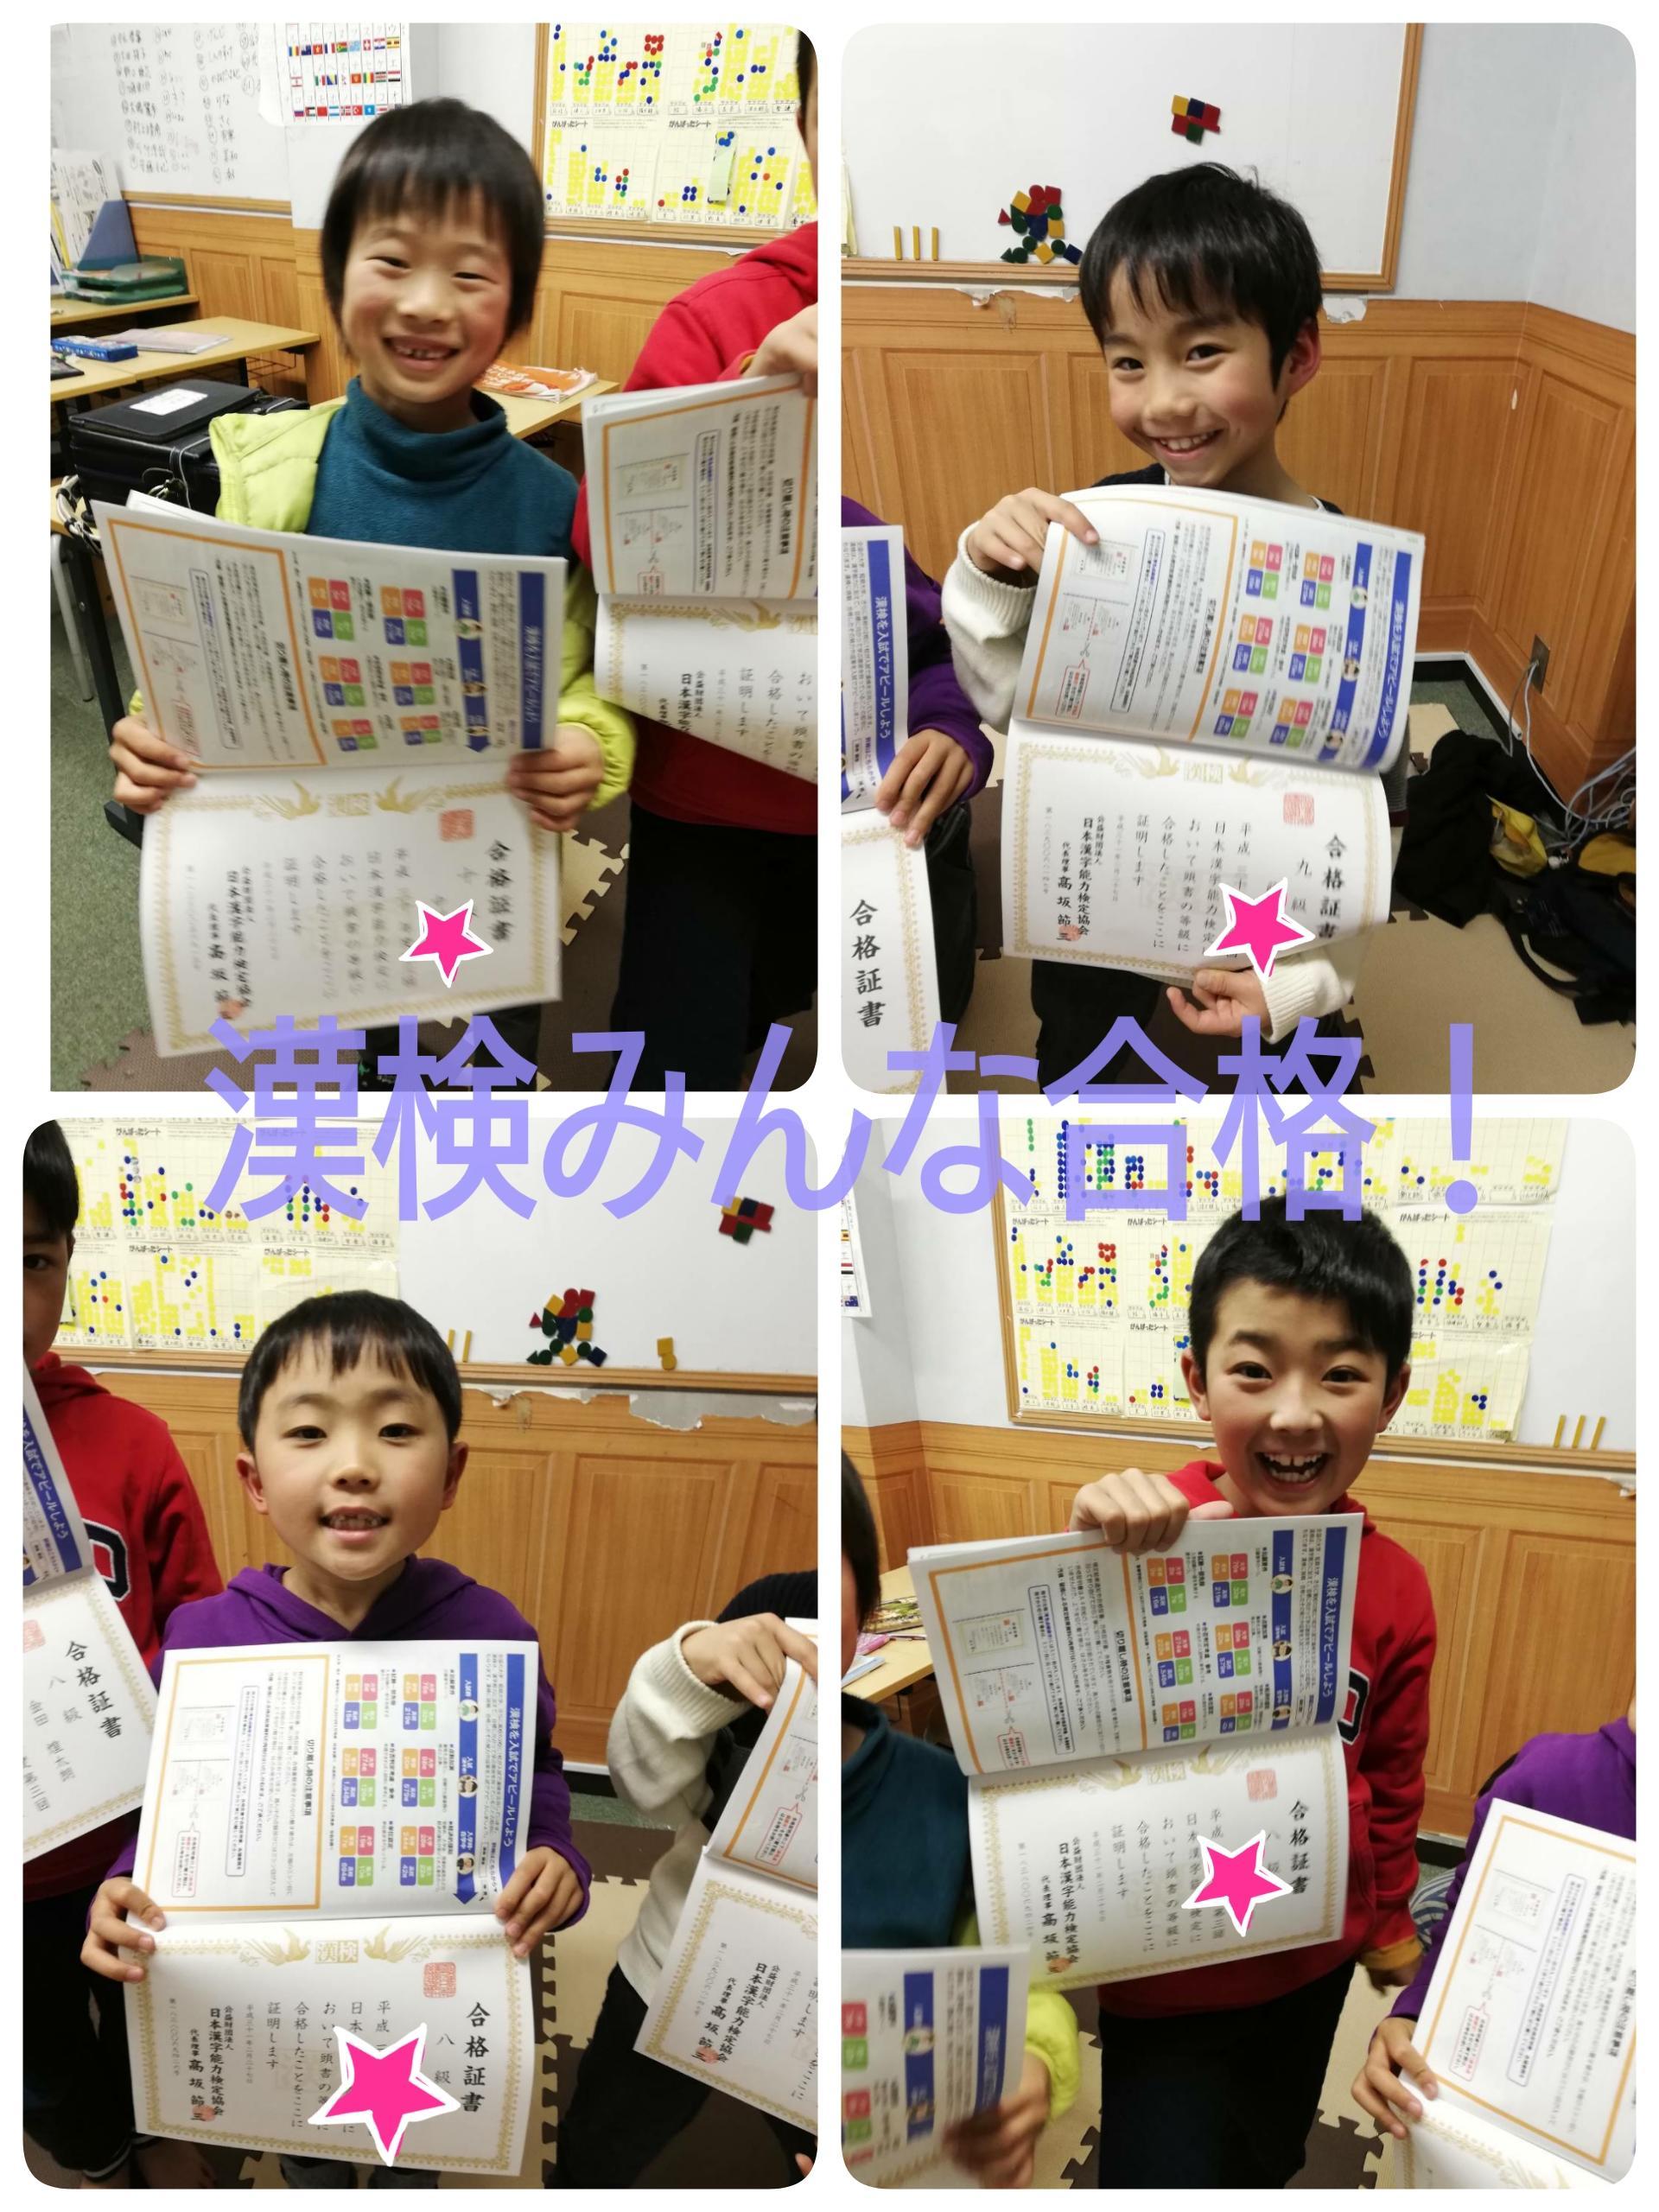 19-03-14-19-03-35-995_deco.jpg